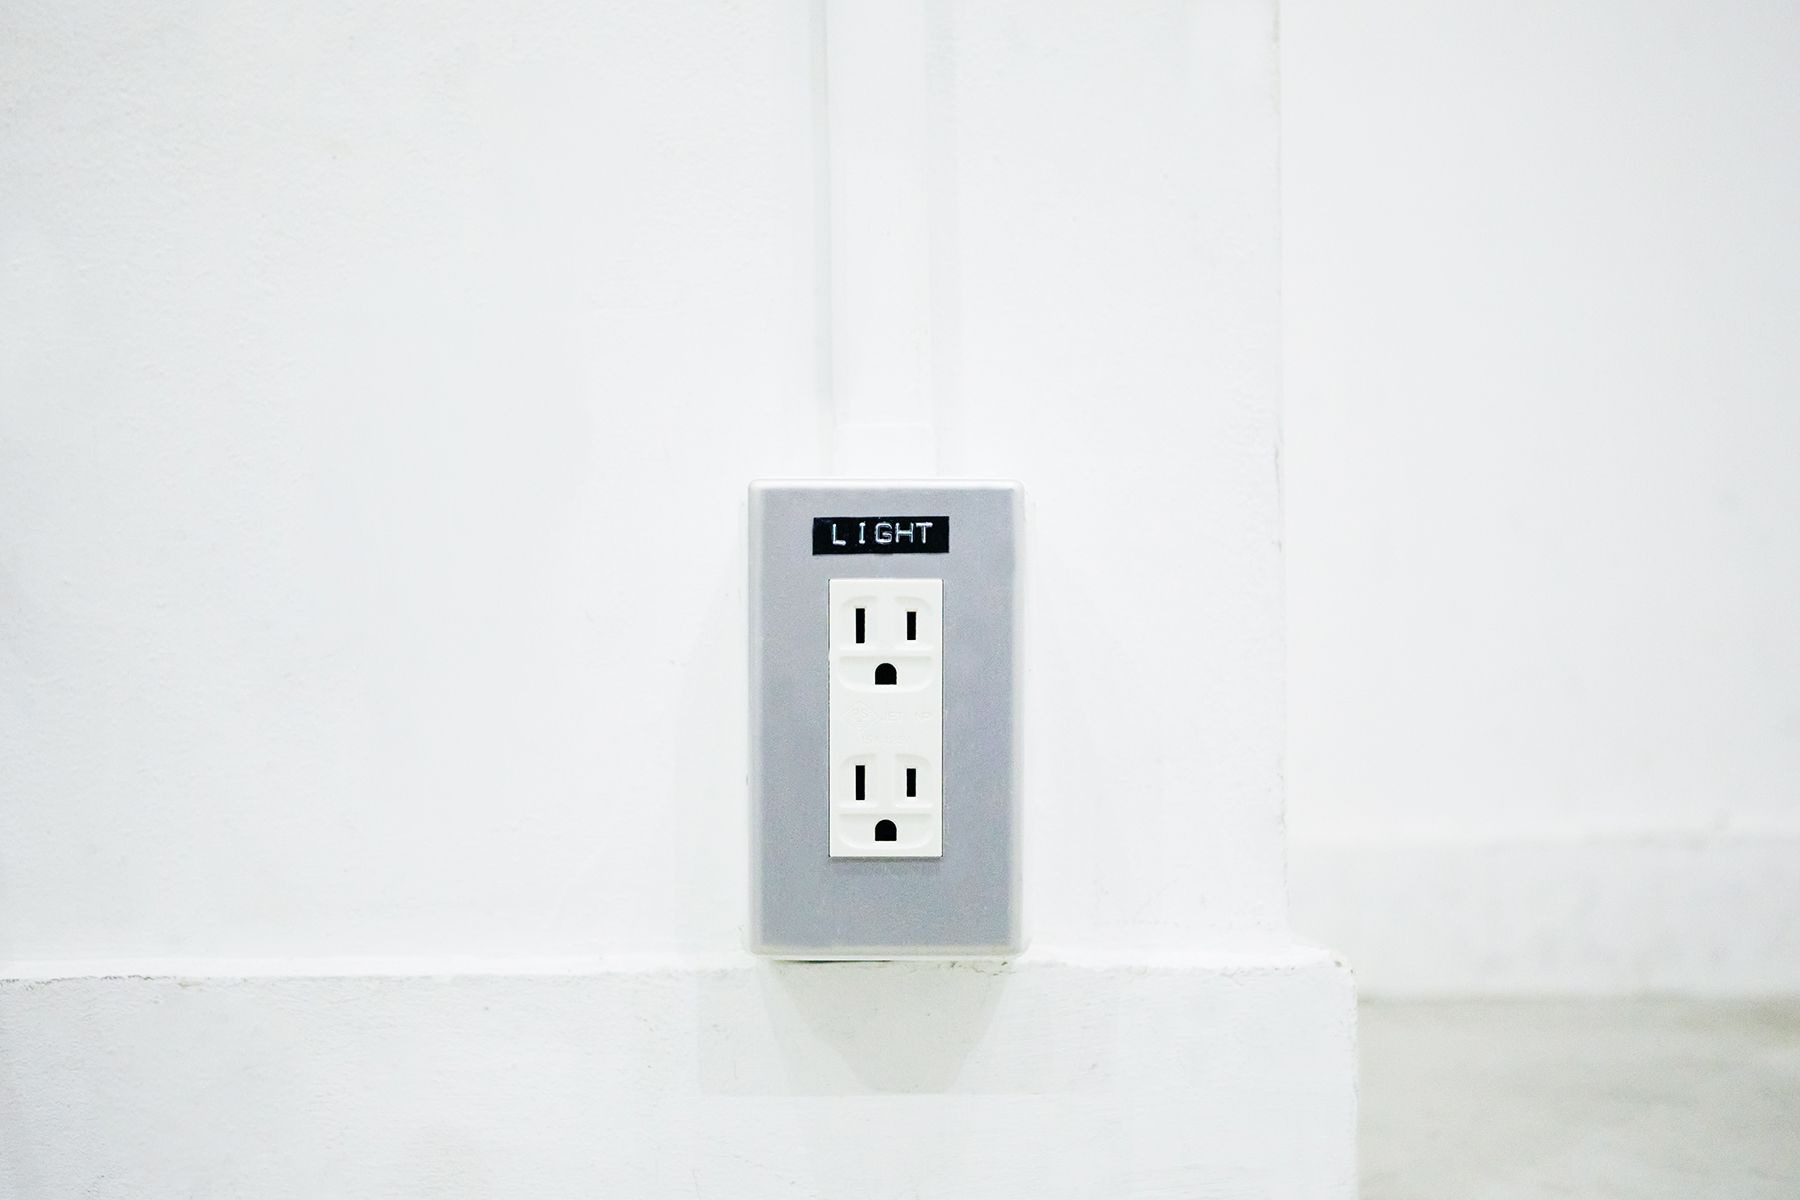 sinca studio 中野坂上 (シンカ スタジオ)照明用コンセントは別回路で安心